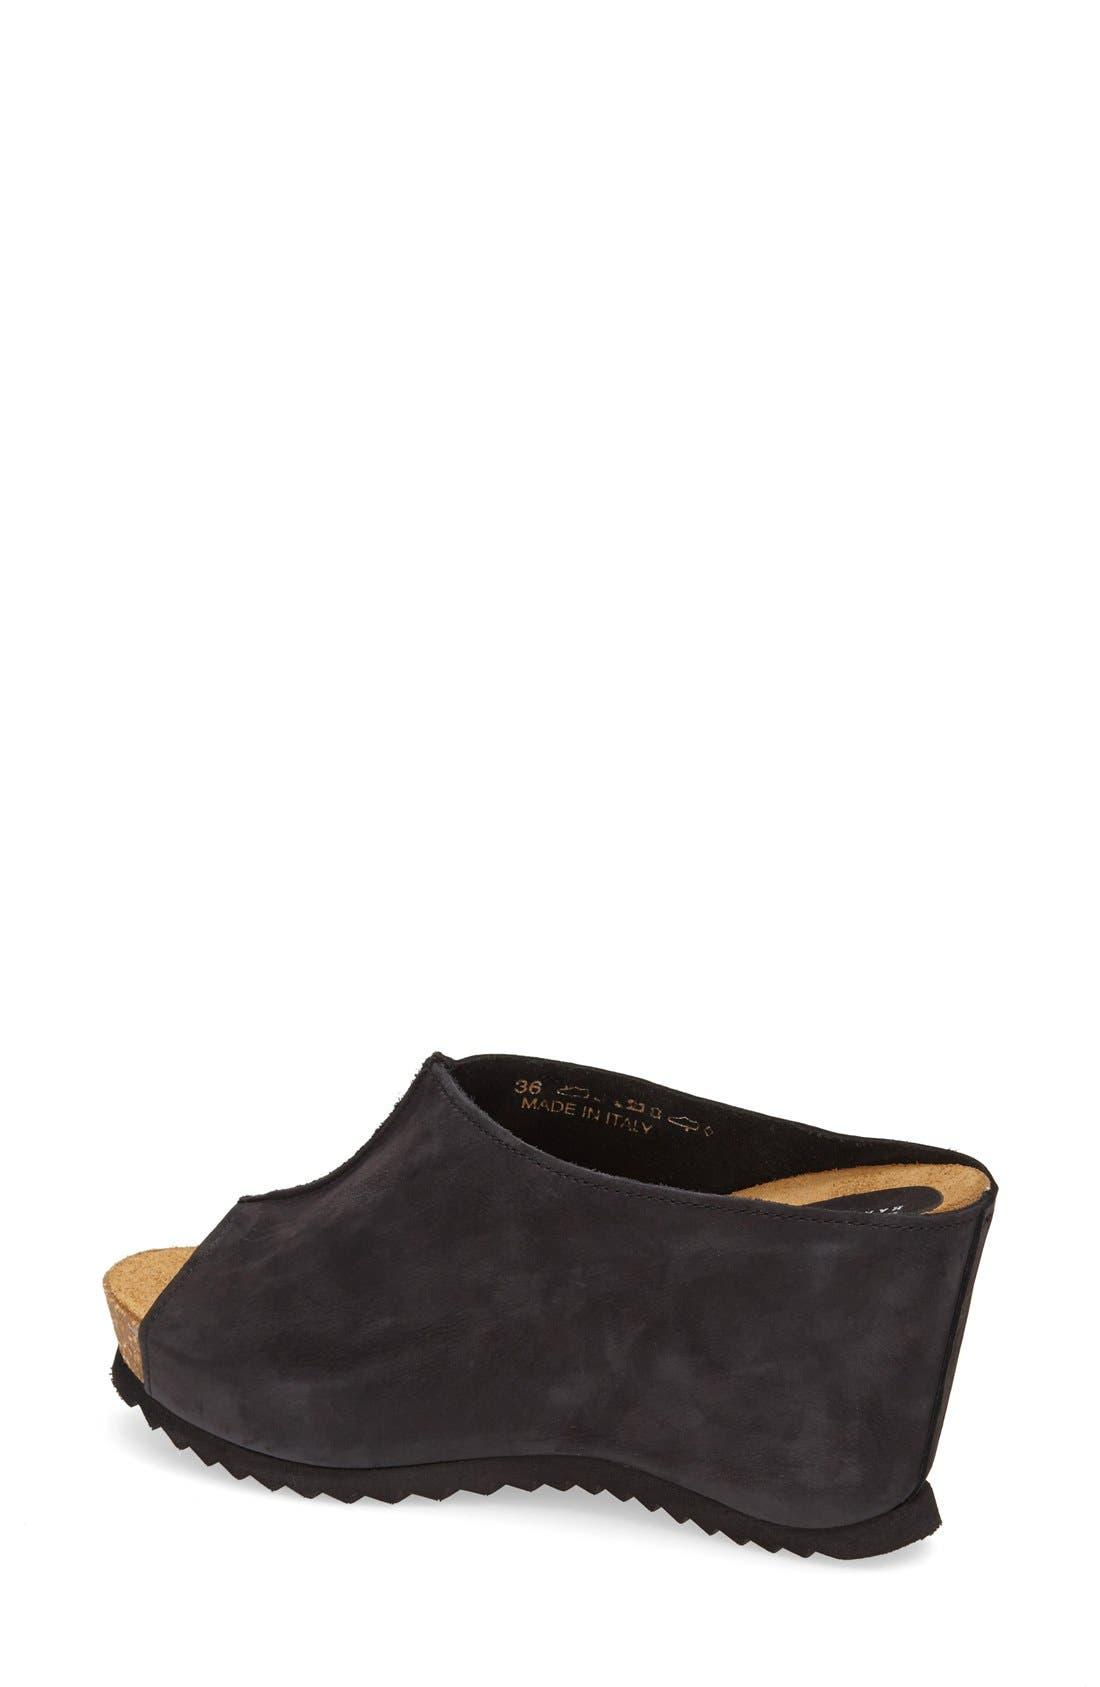 Alternate Image 2  - Anyi Lu 'Sara' Nubuck Leather Peep Toe Mule Wedge (Women)